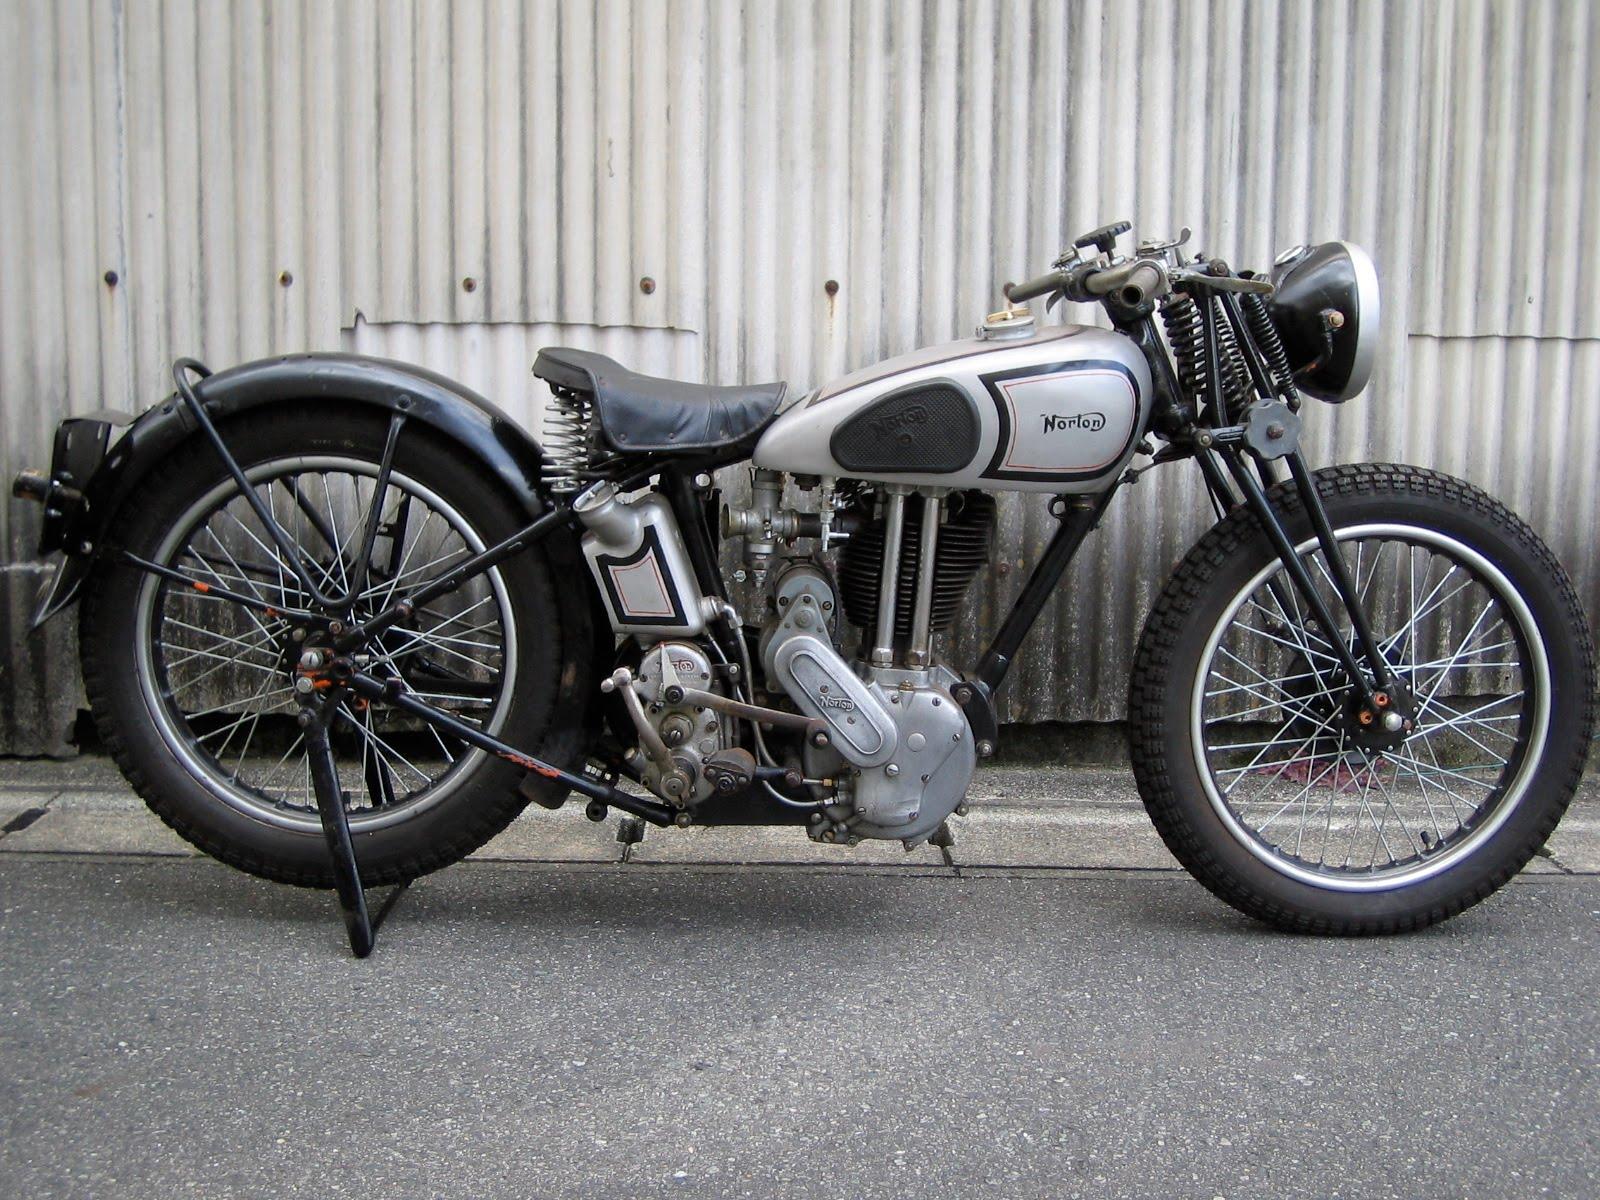 Vintage norton motorcycles shunsuke 39 s 1936 model 18 norton for The norton